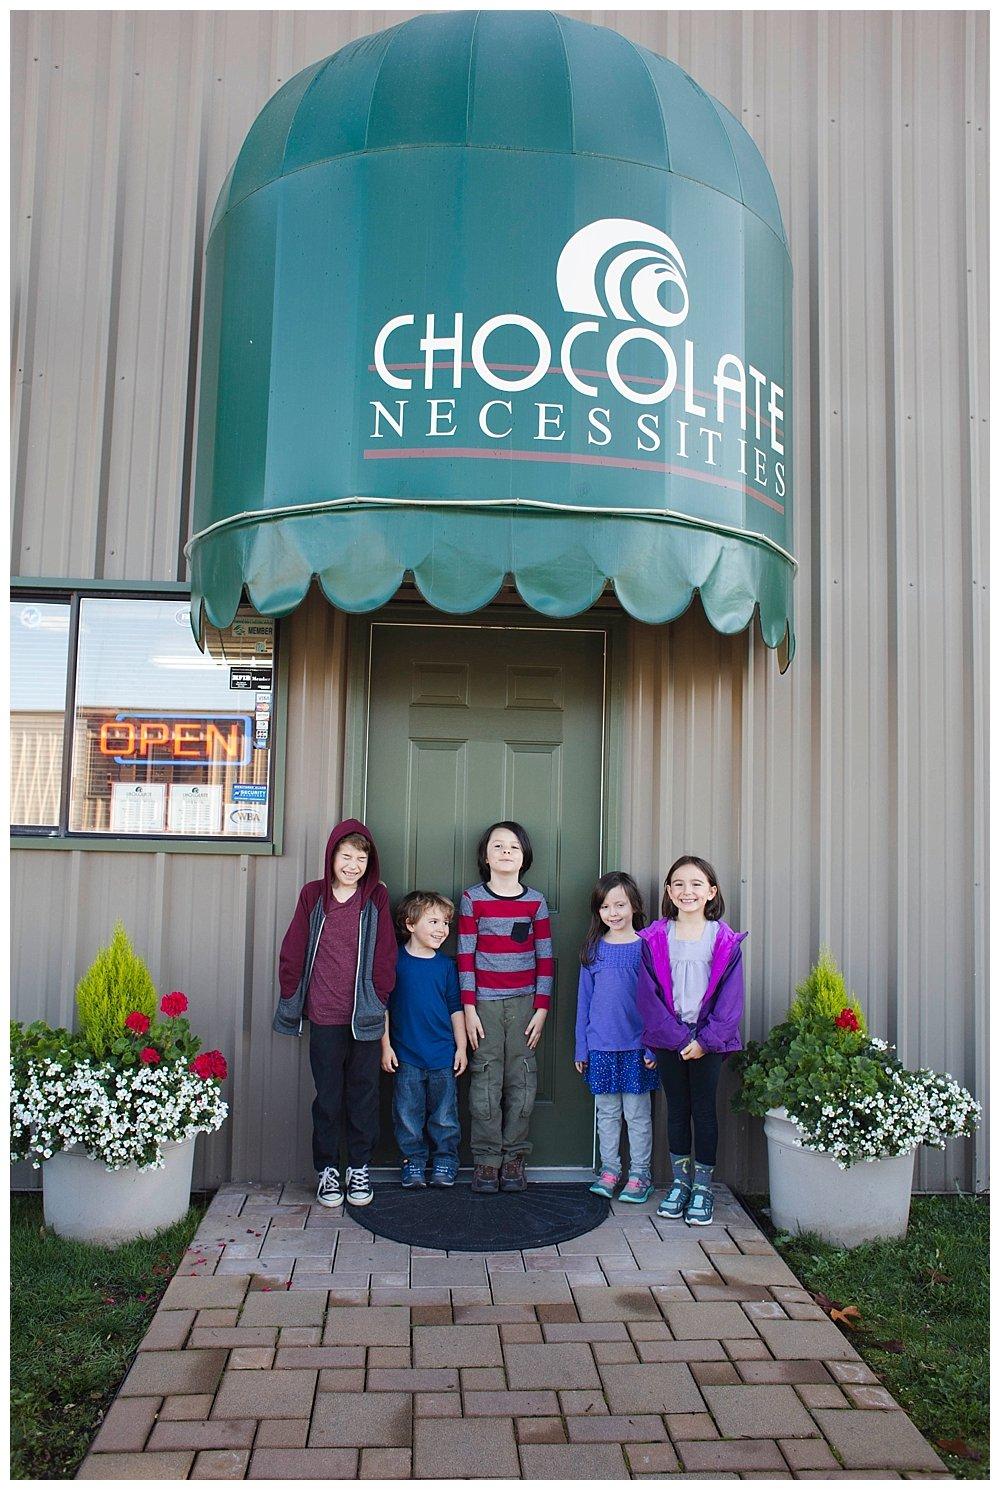 Chocolate Necessities Tour: PNW Homeschool Adventures